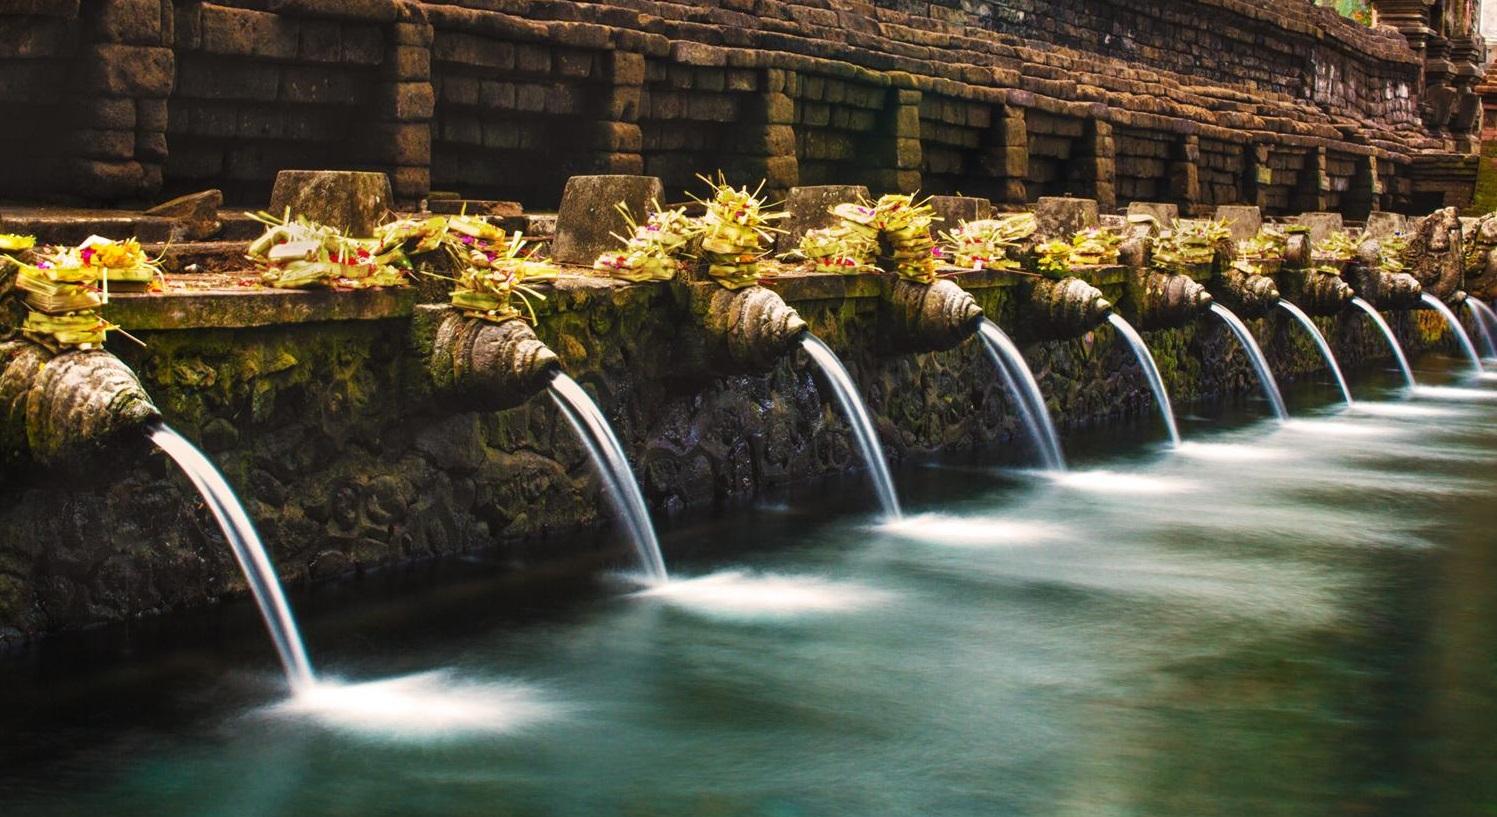 Tirta-Empul-Bali-Hello-Travel-5.jpg